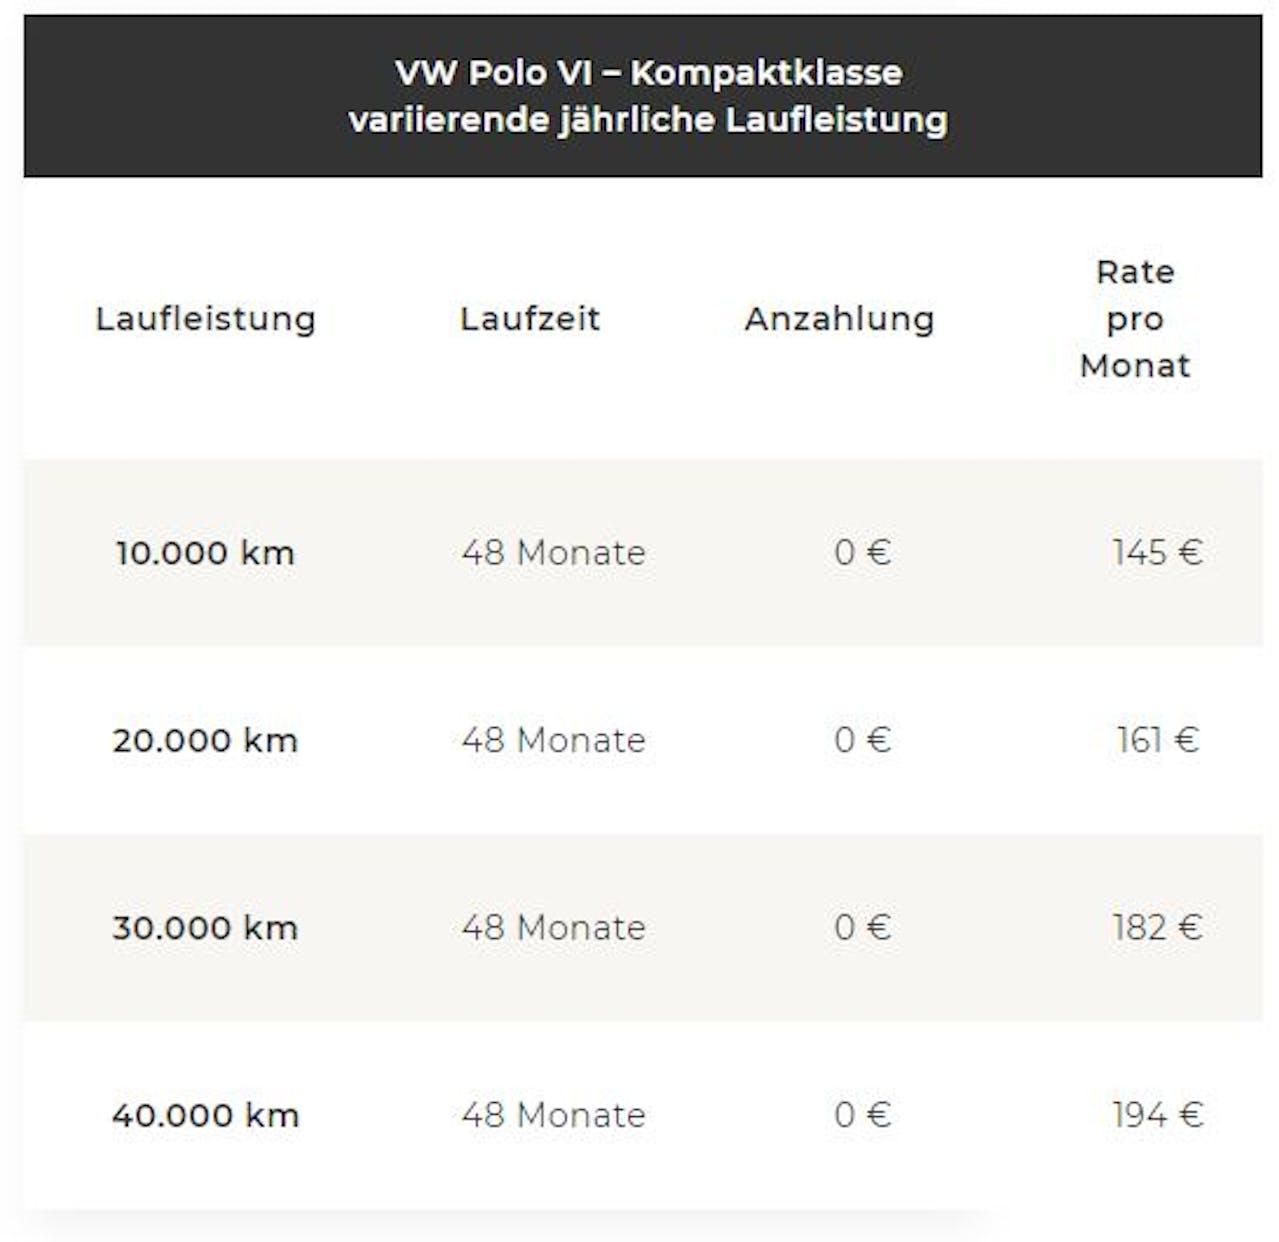 Tabelle VW Polo veriierende Laufleistung